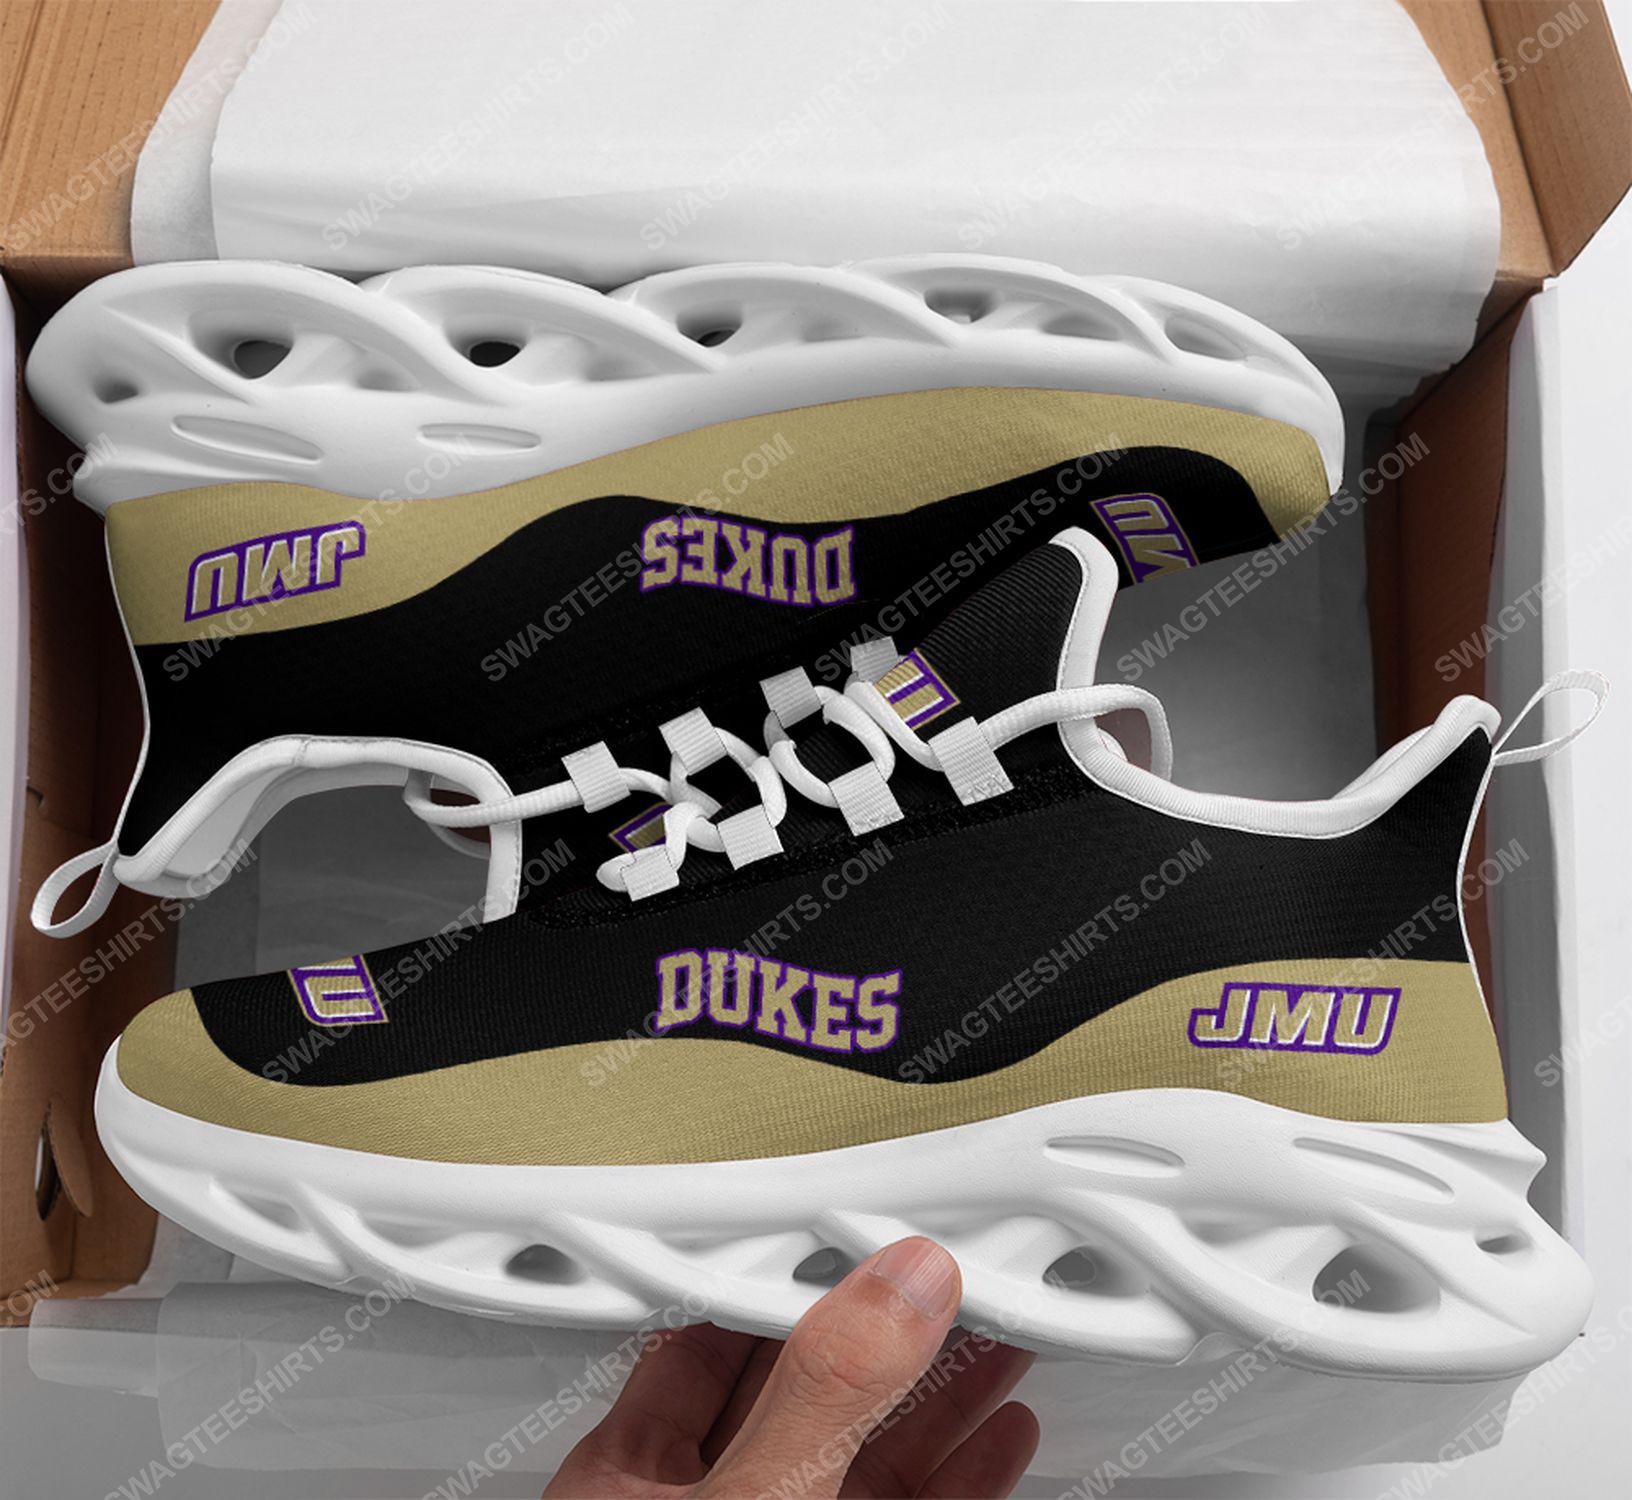 The james madison dukes football team max soul shoes 1